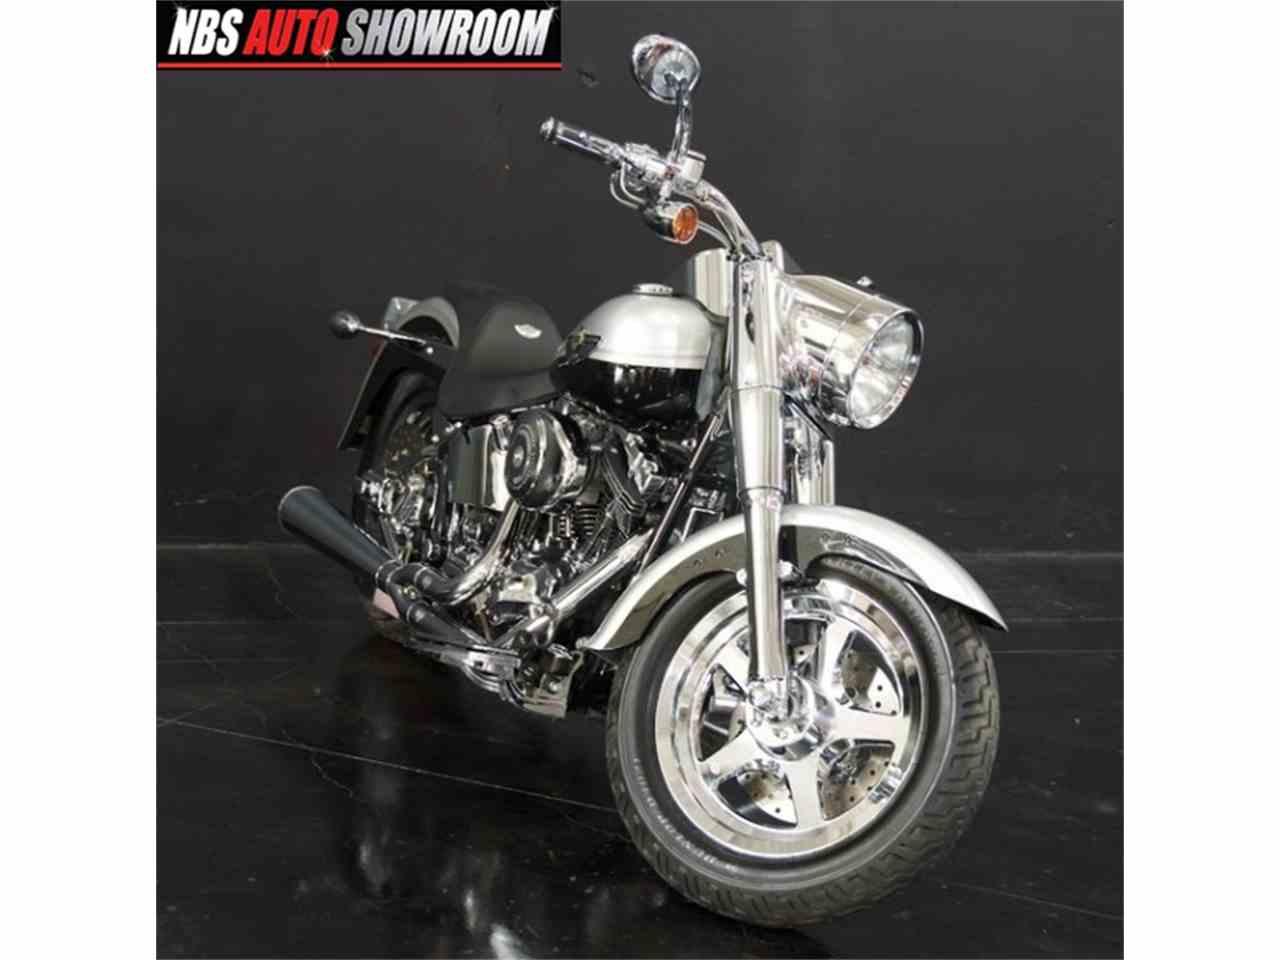 Large Picture of '03 Harley Davidson SCREAMING EAGLE - $8,003.00 - IVXN